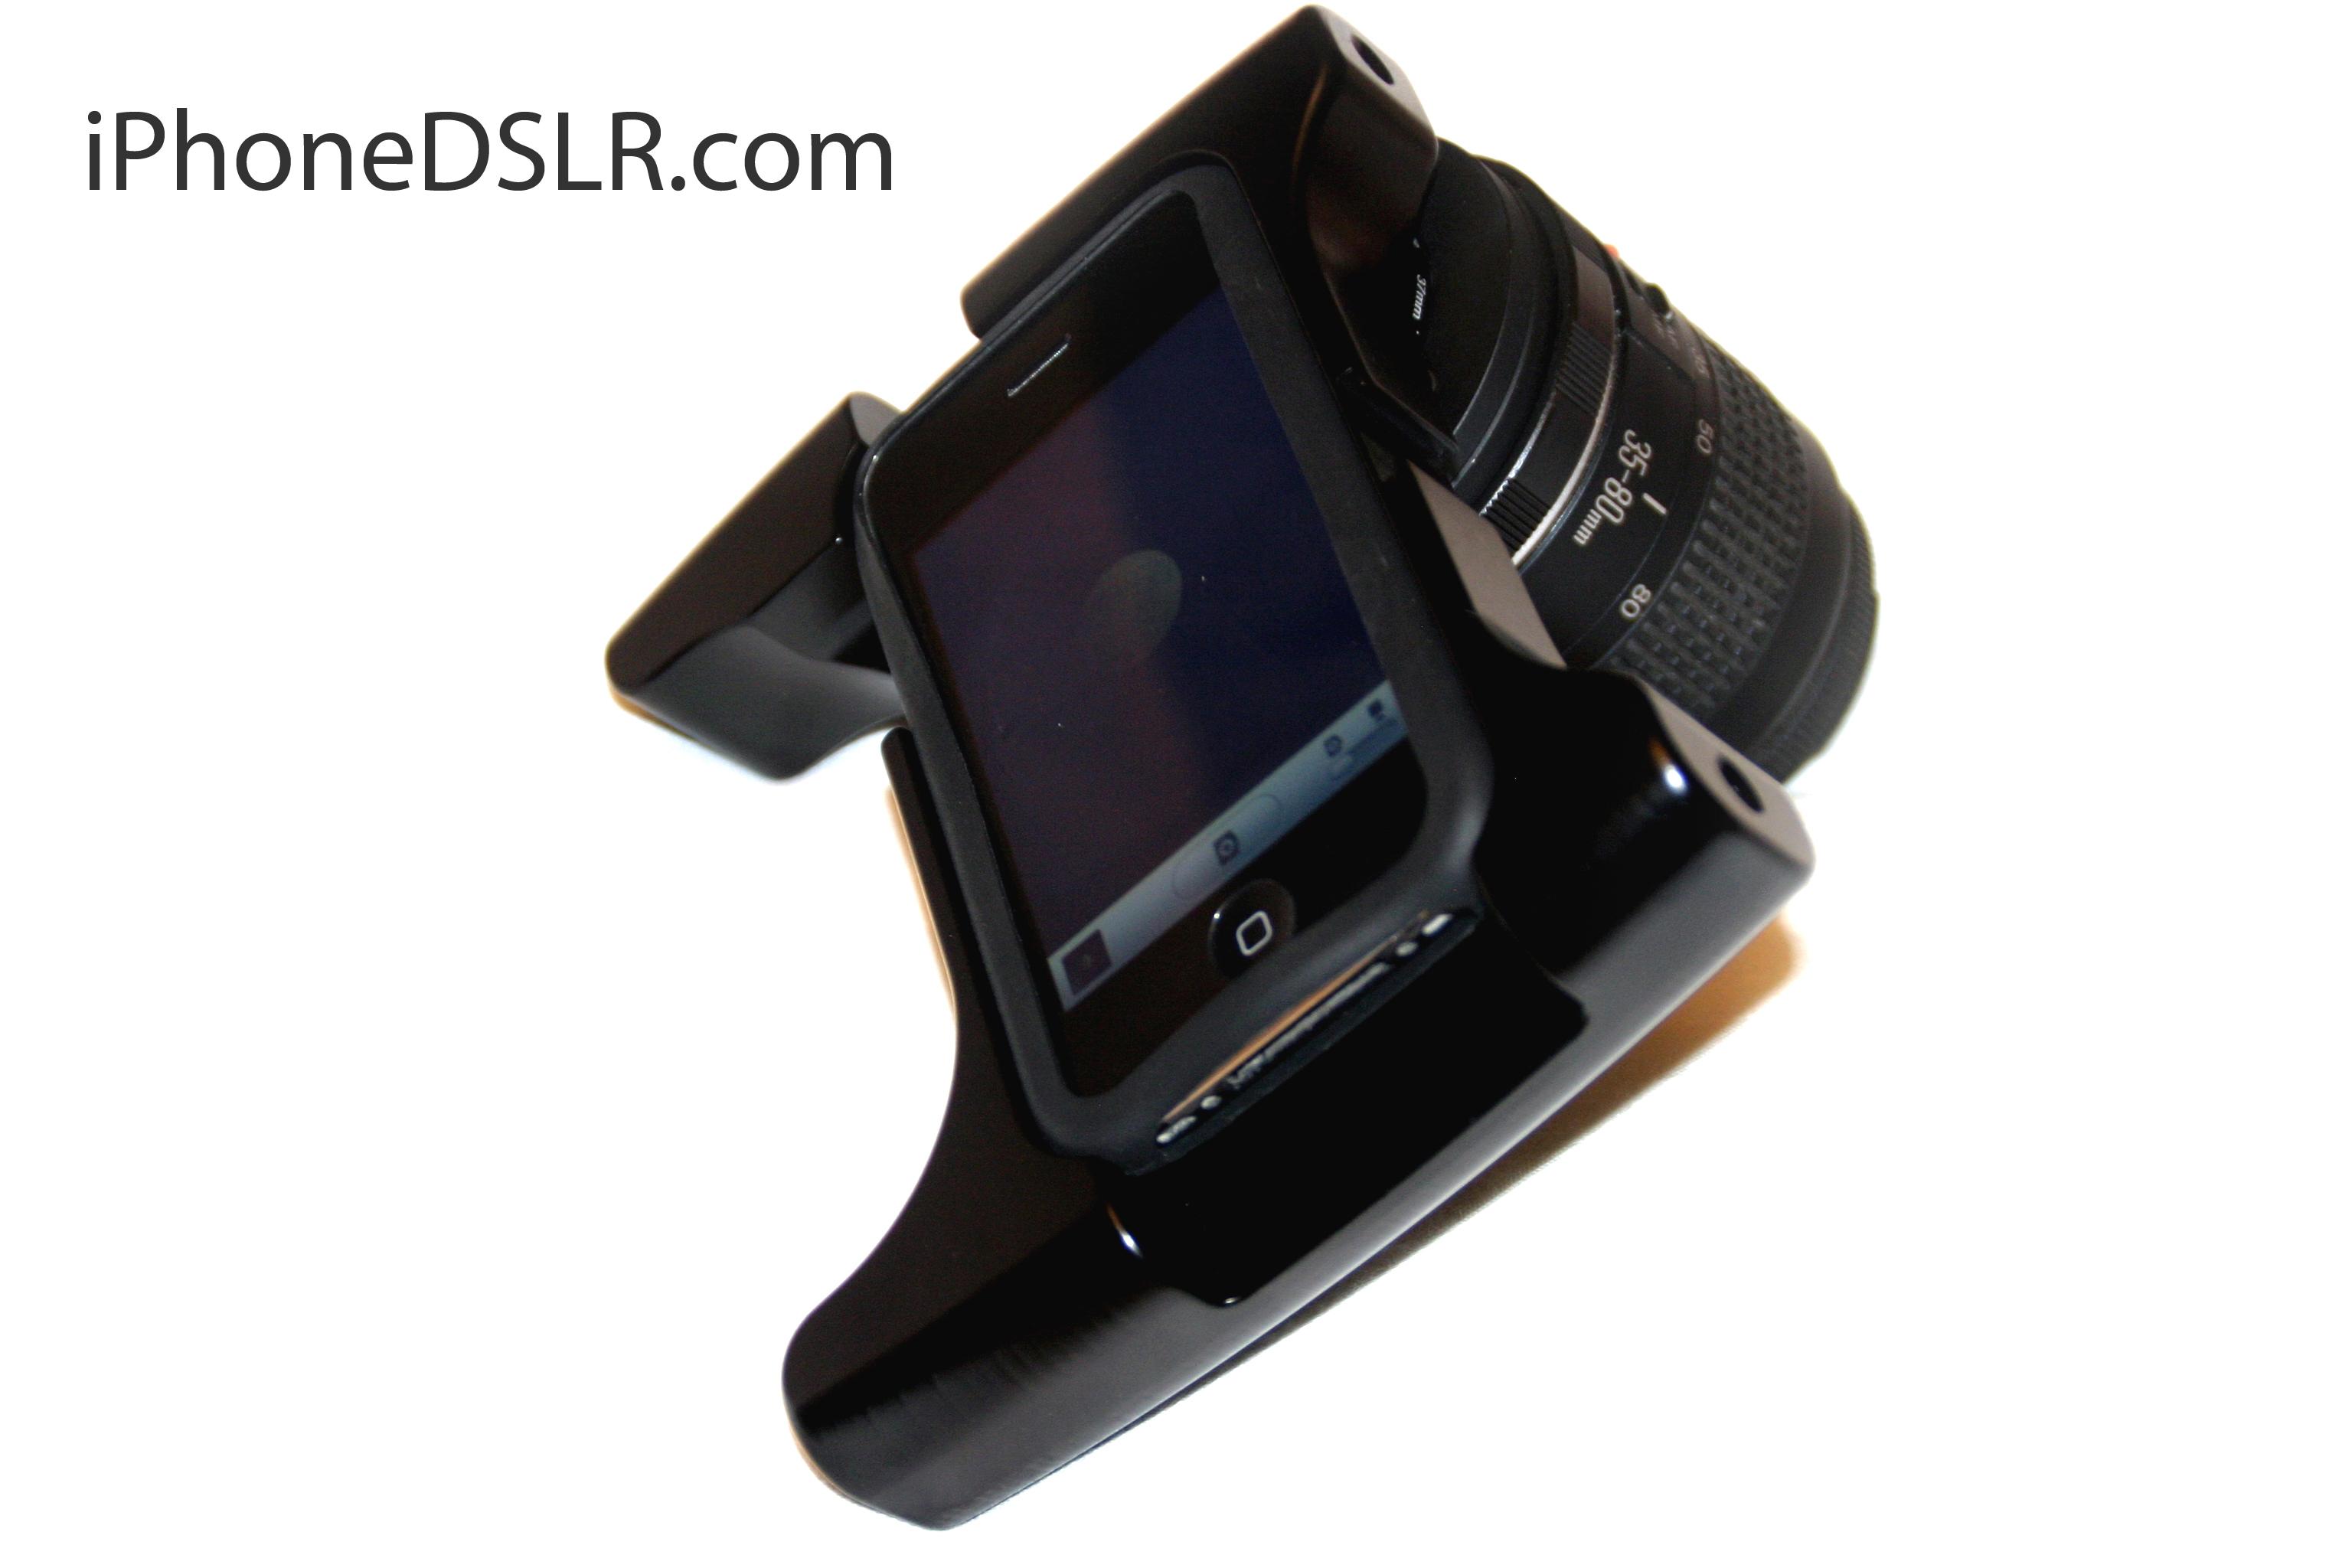 iPhone DSLR com OWLE Bubo